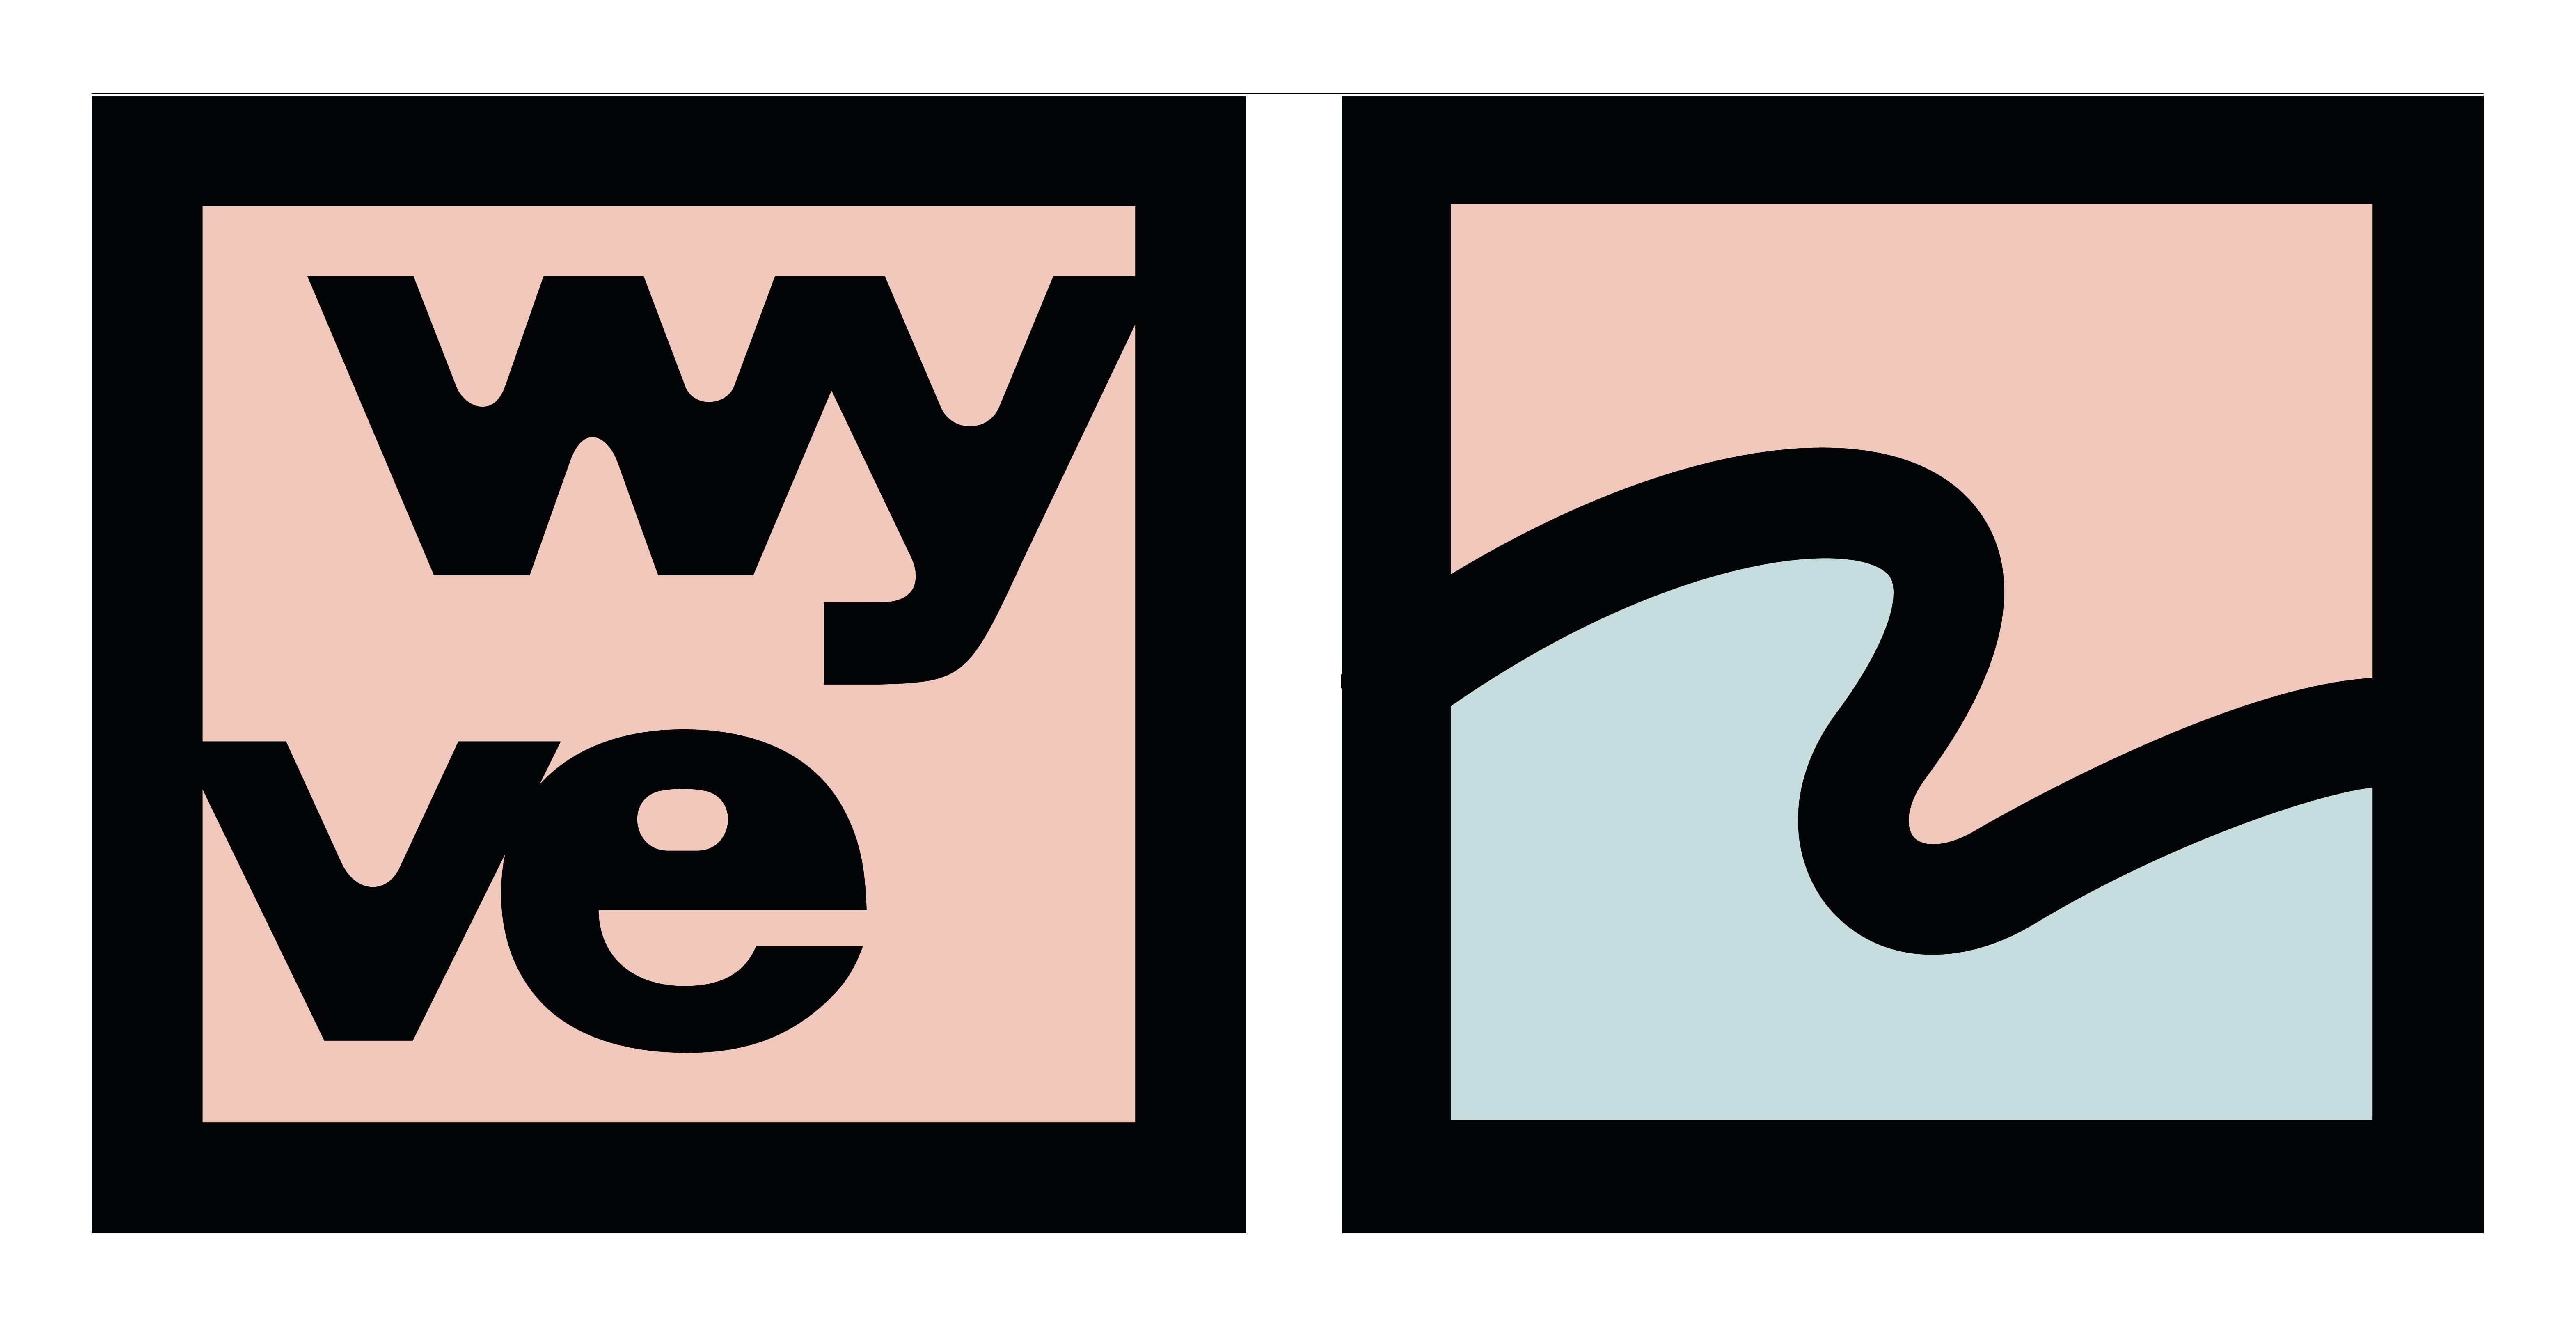 wyve logo